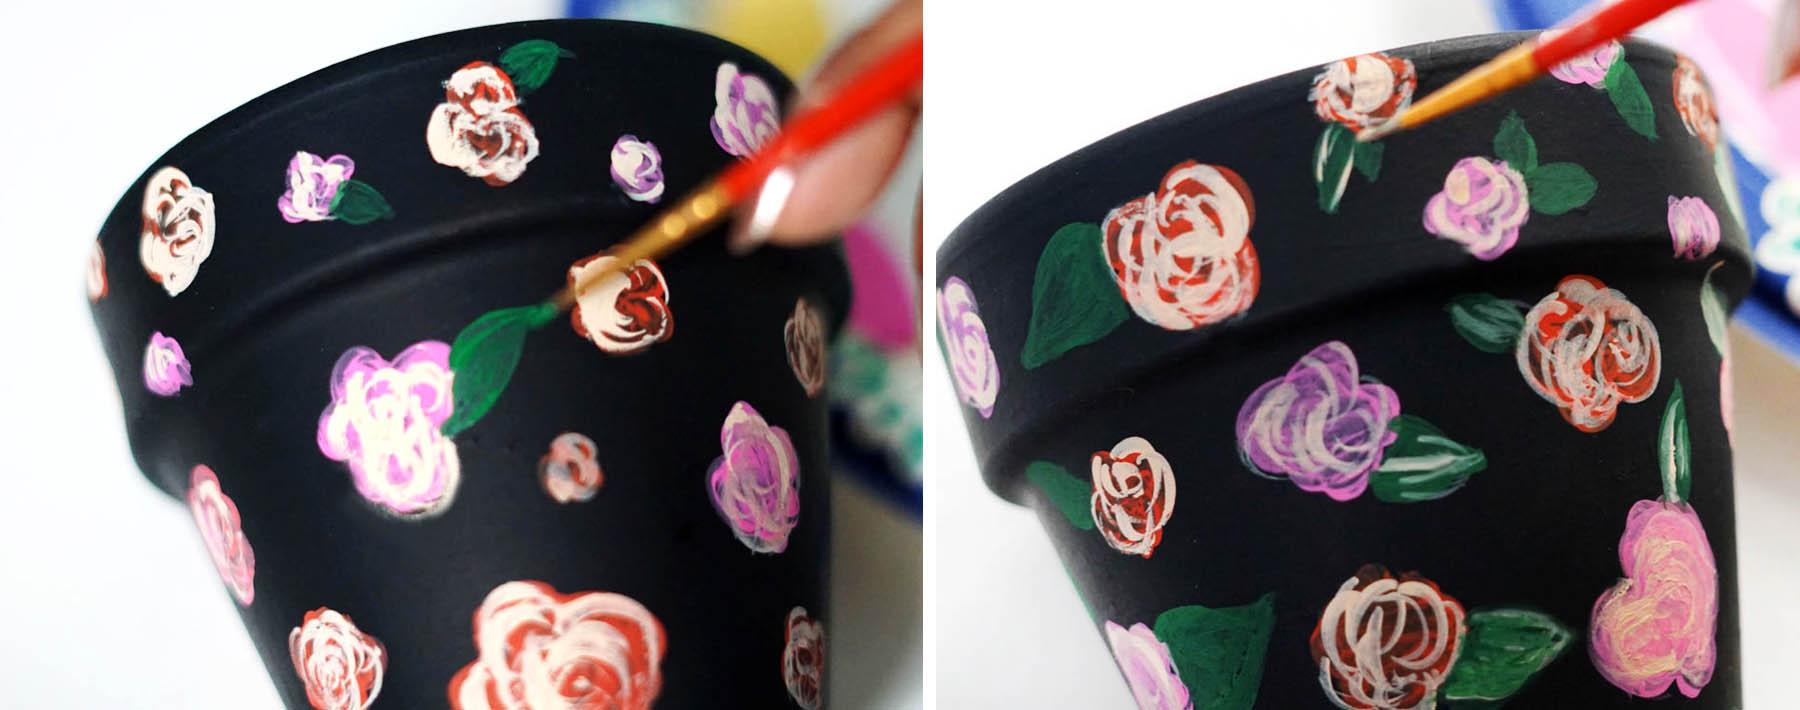 Terra Cotta Pot Design Painted Art